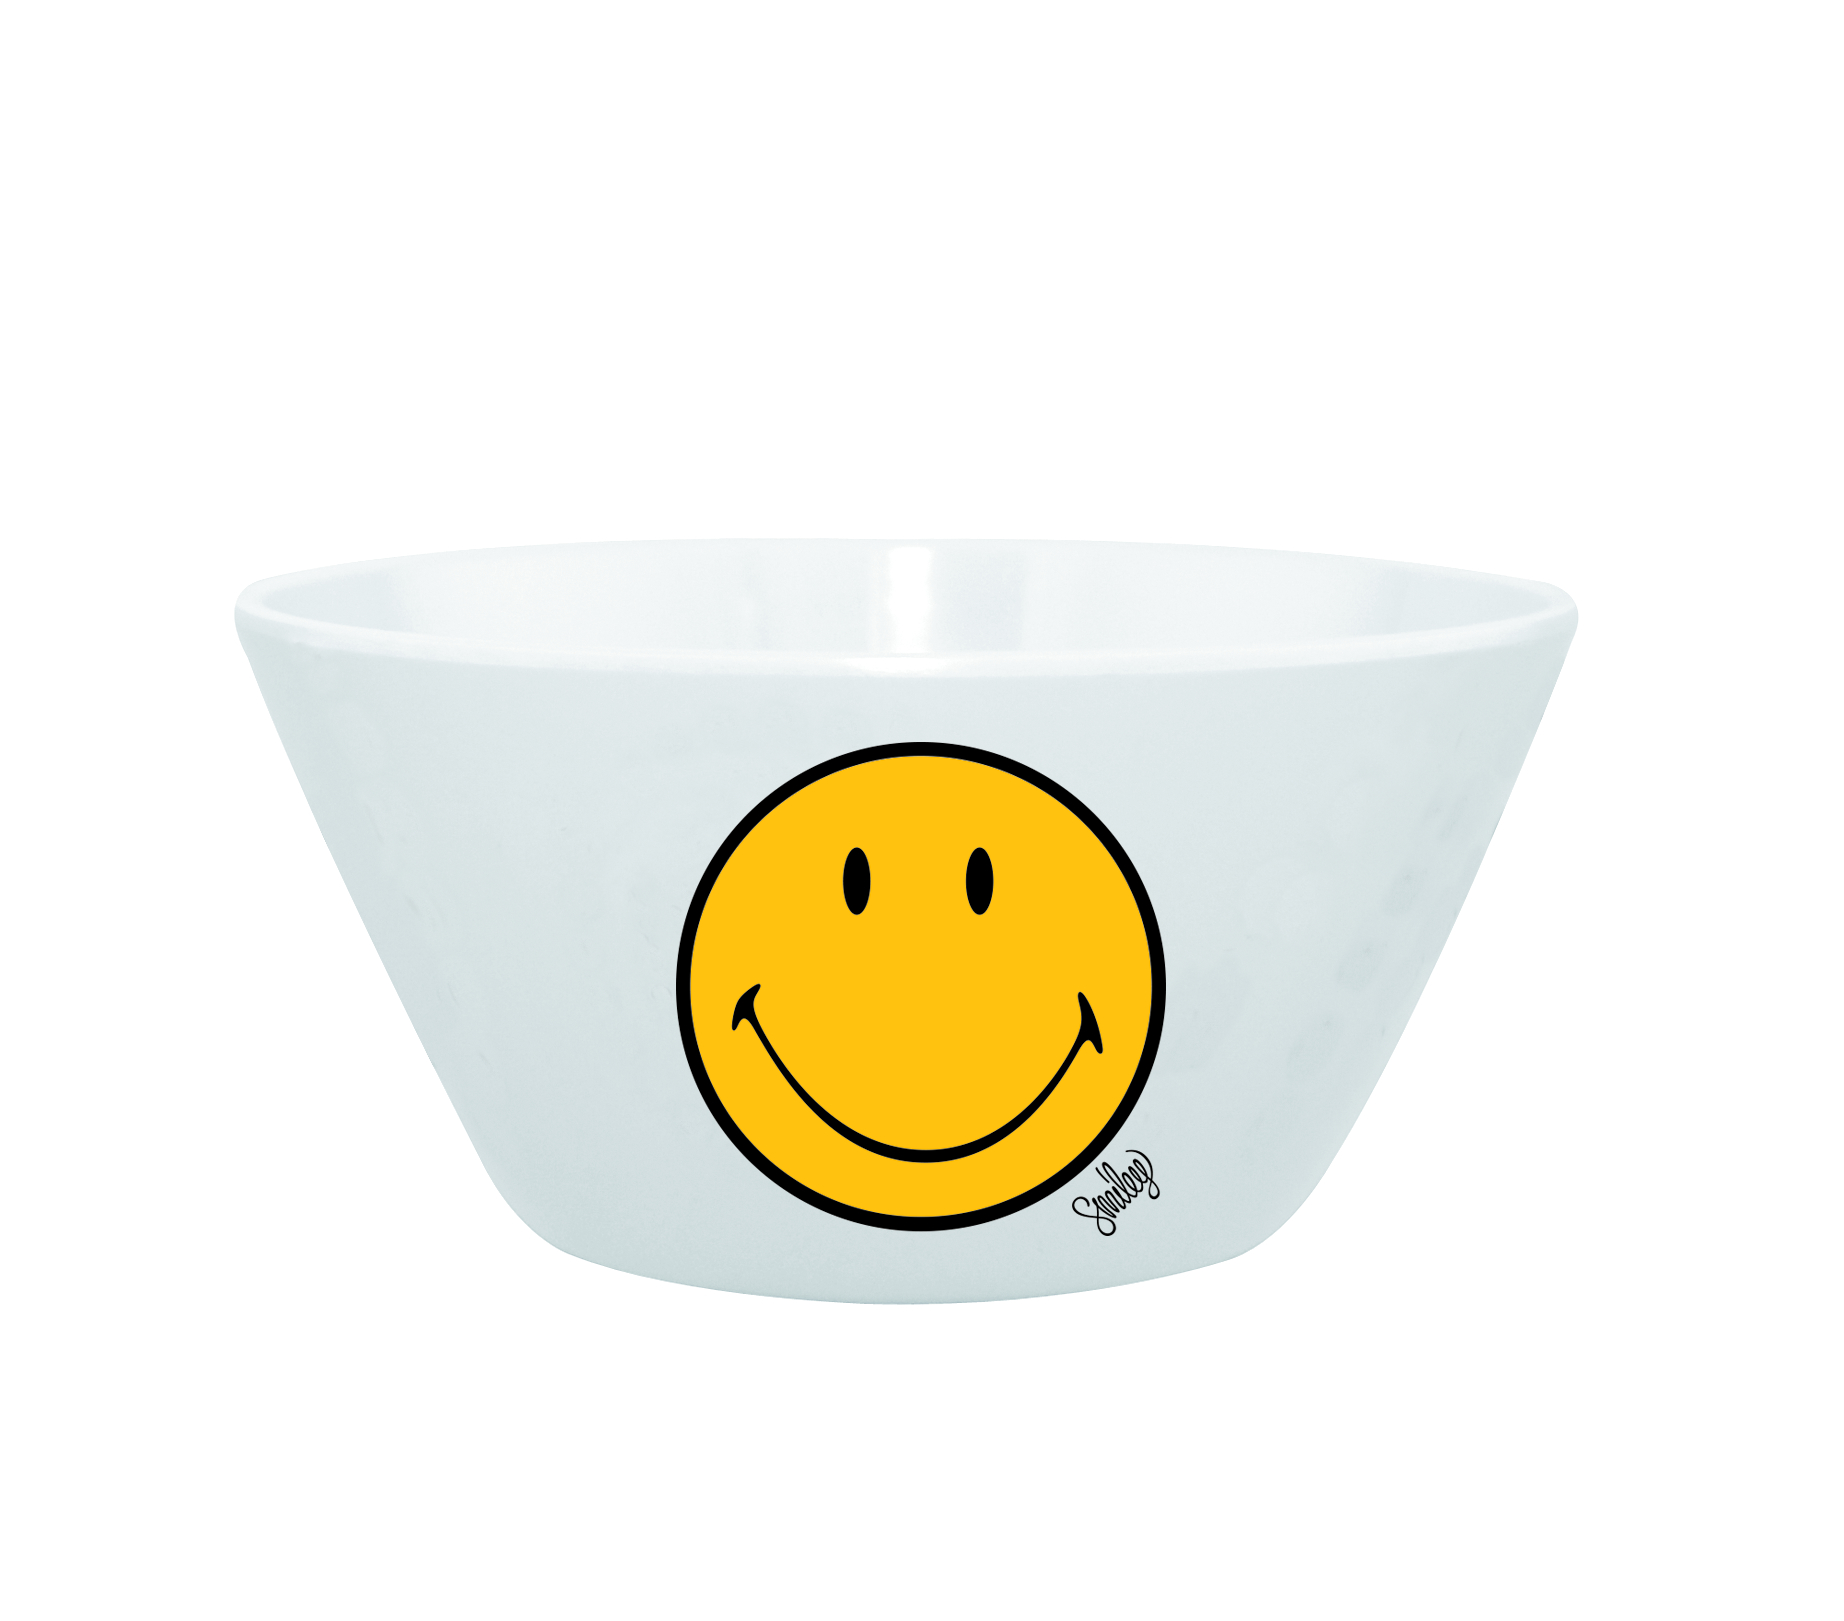 Mini Bol pentru cereale Smiley Galben/Alb, Ø15 cm imagine